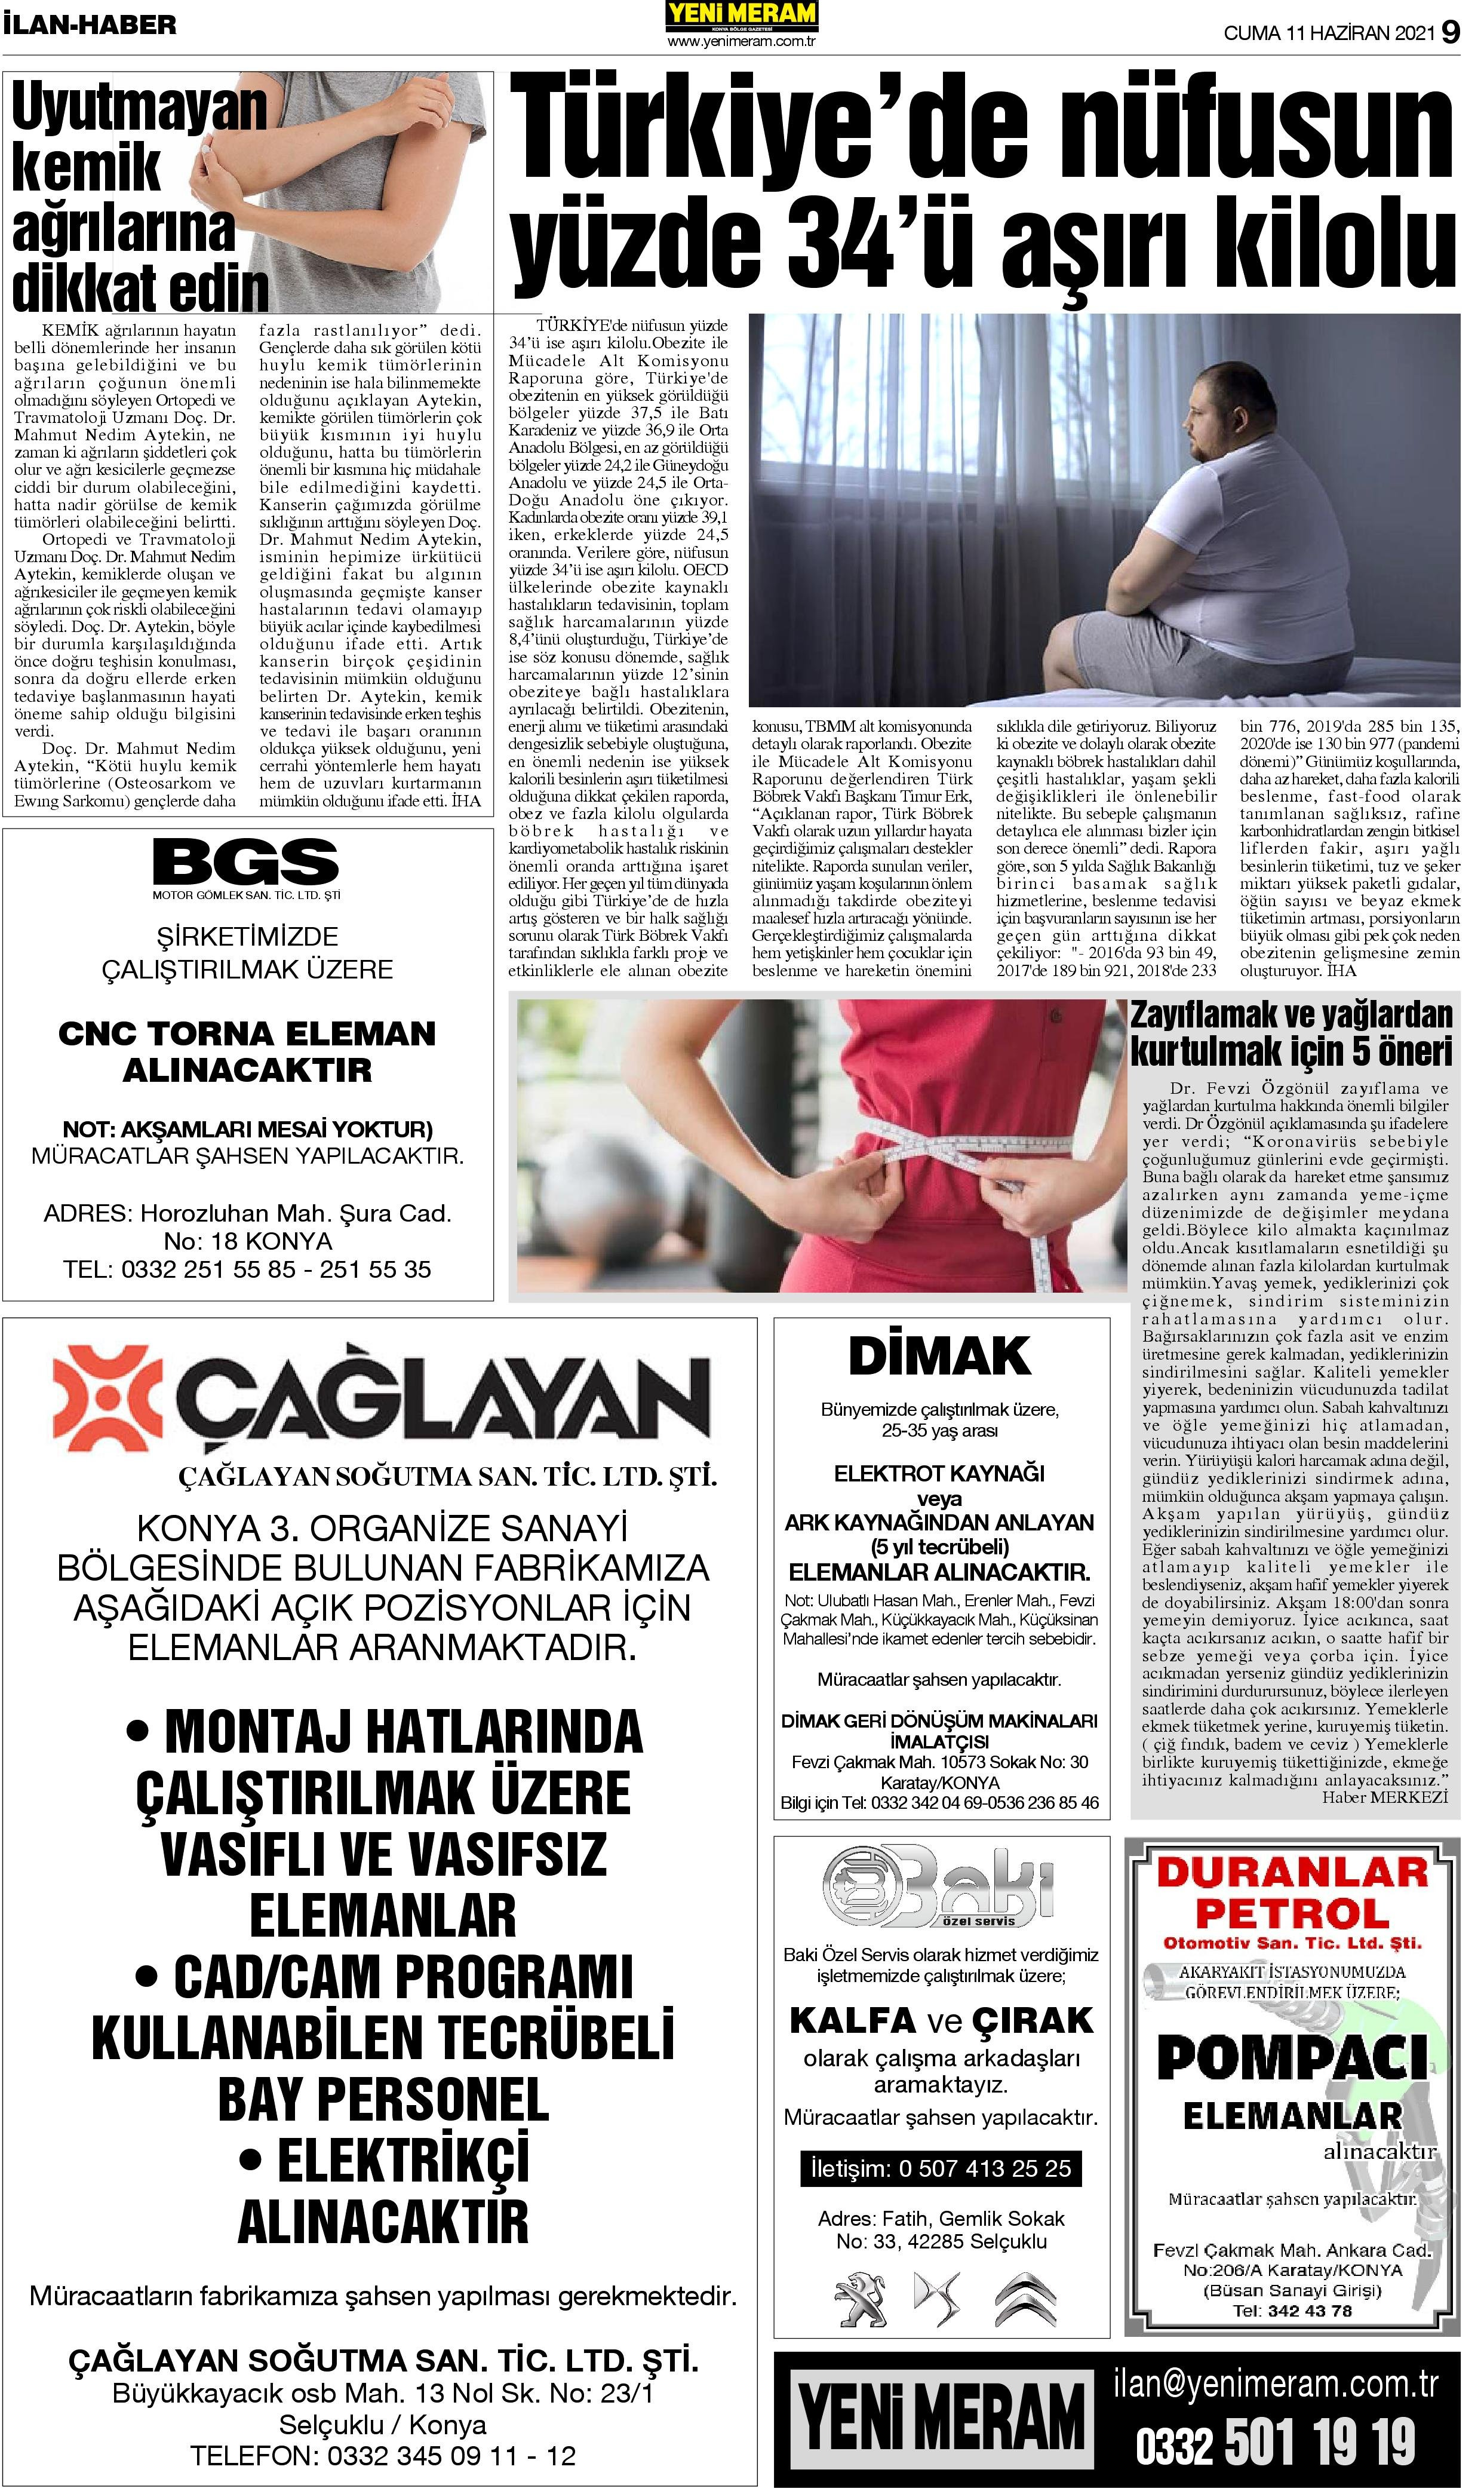 11 Haziran 2021 Yeni Meram Gazetesi